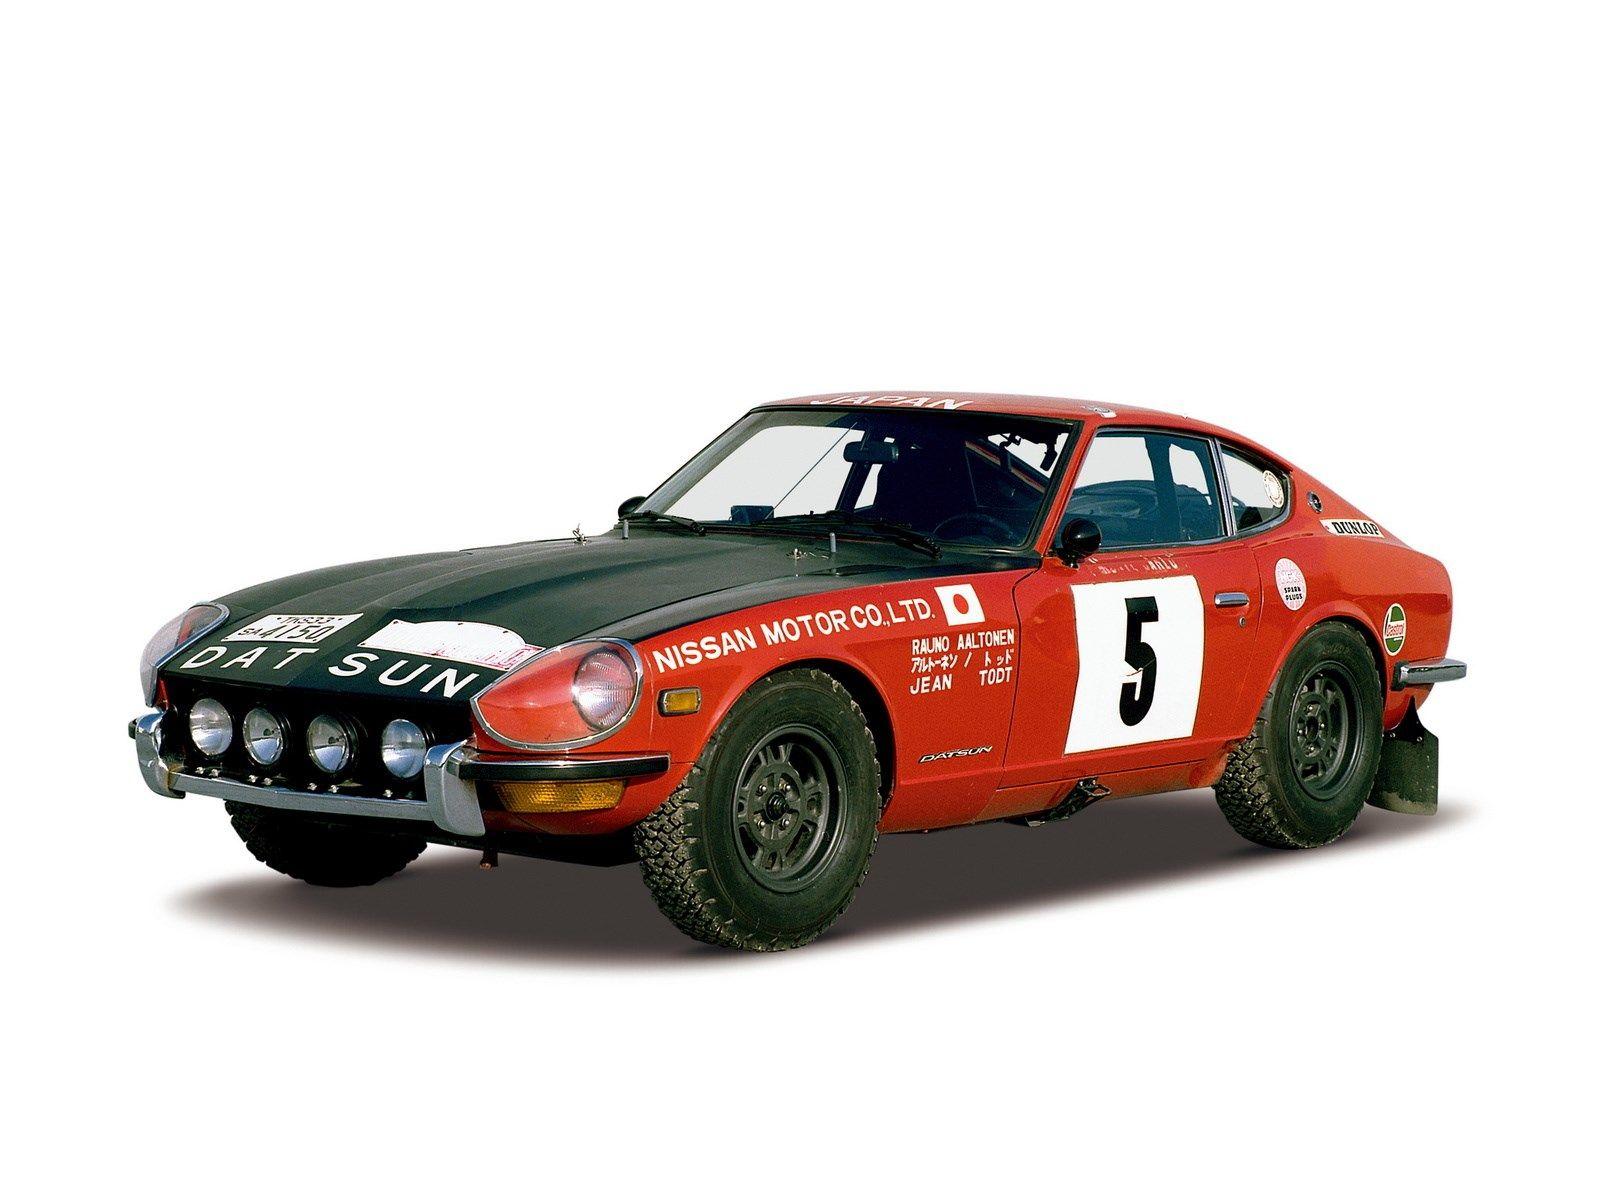 2017 06 1976 datsun 280z engine block for sale - 2017 03 06 Race Car Wallpaper Hd Pack 1694041